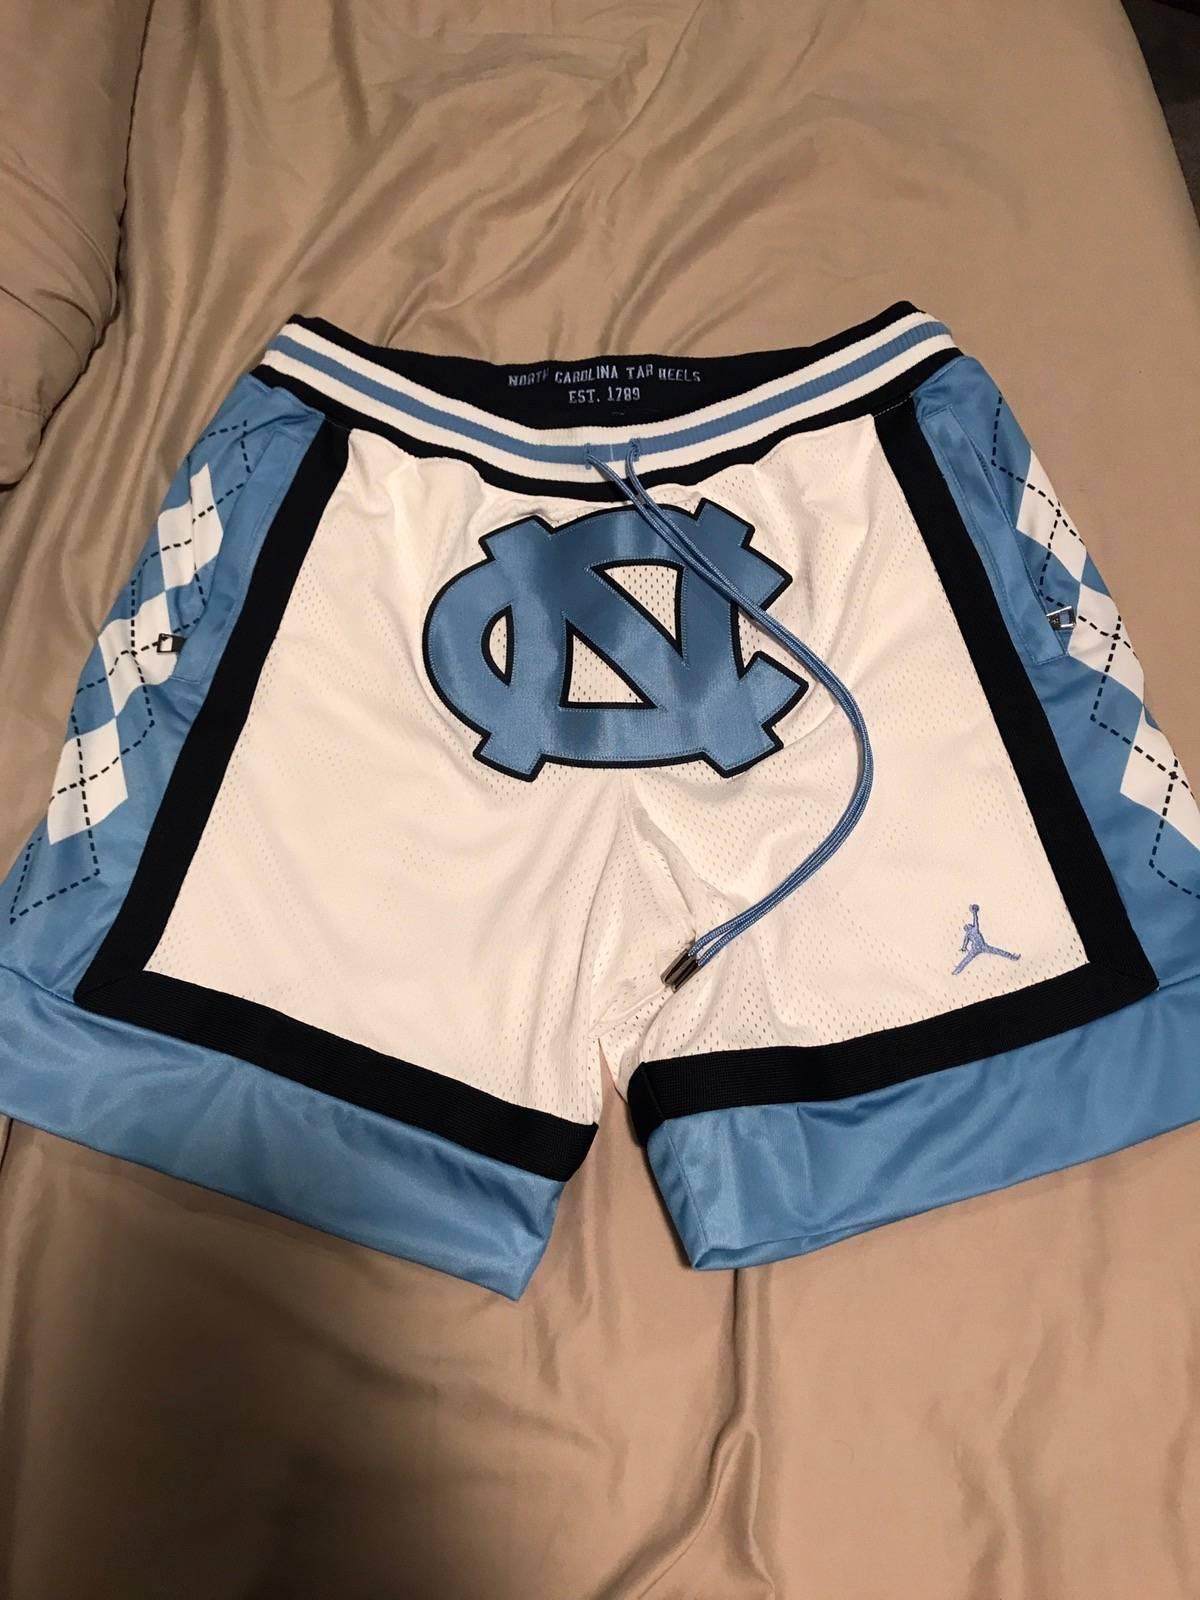 Jordan Brand × Just Don Just Don X Jumpan Unc Basketball Shorts Size 33 $350